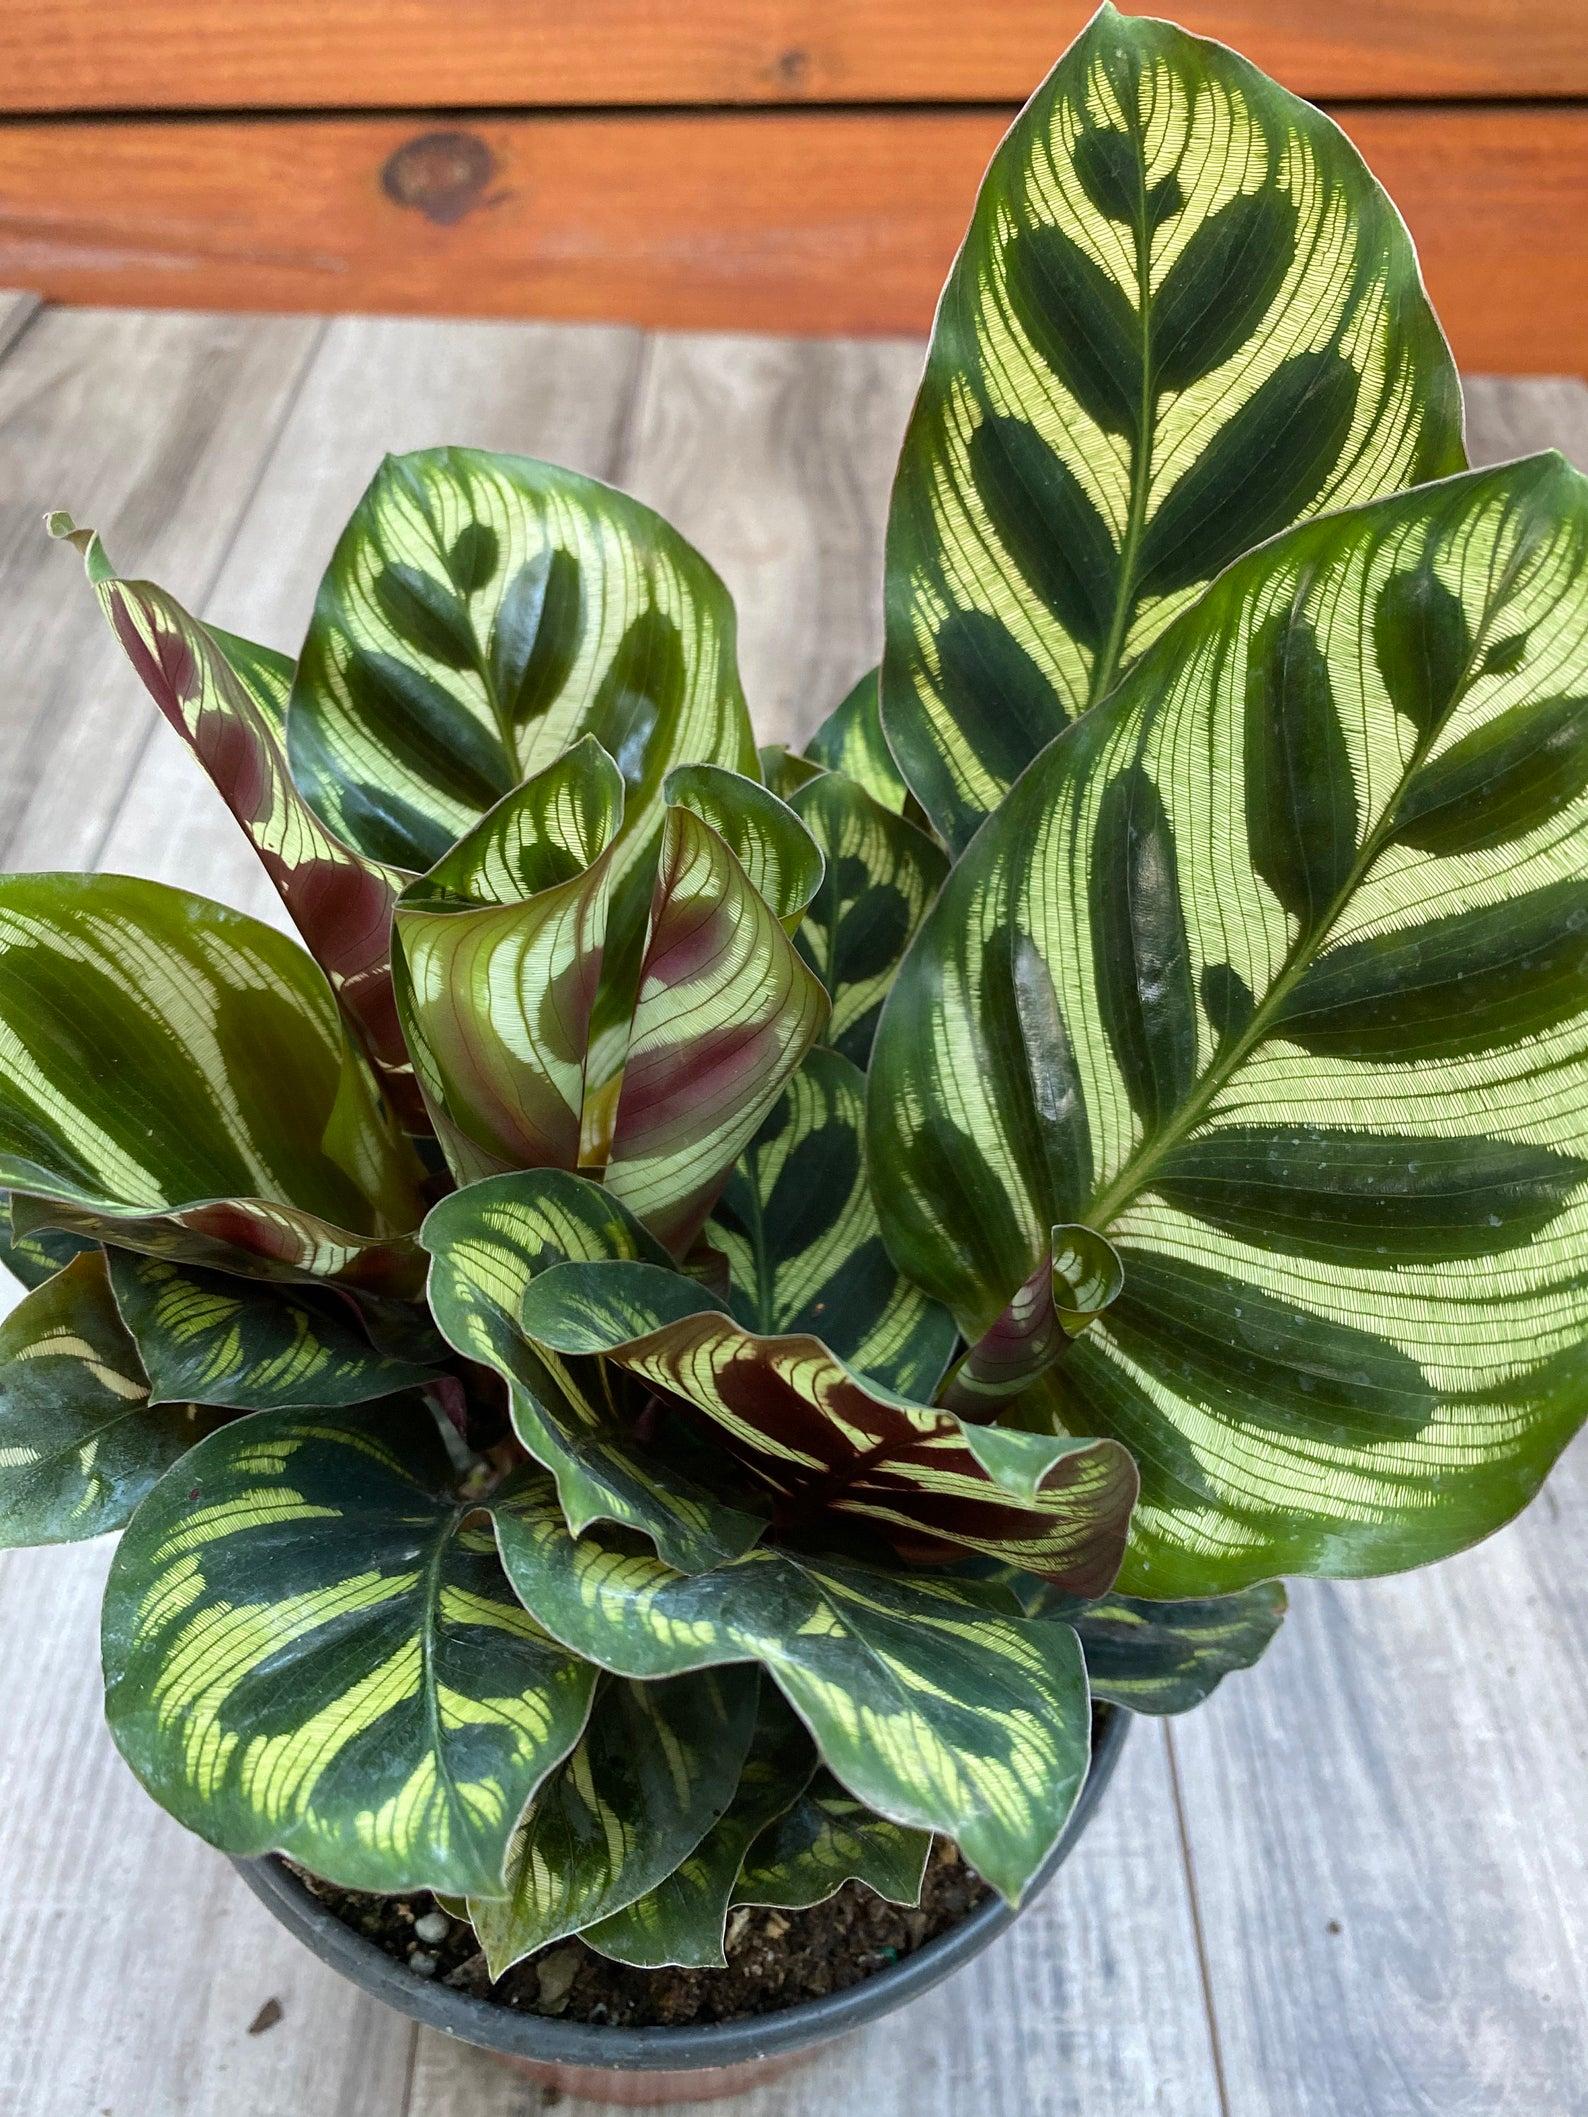 20 Trendy Dog Safe House Plants for 2021 feat. Prayer Plant - Image via Tropical Plants FL (Etsy)